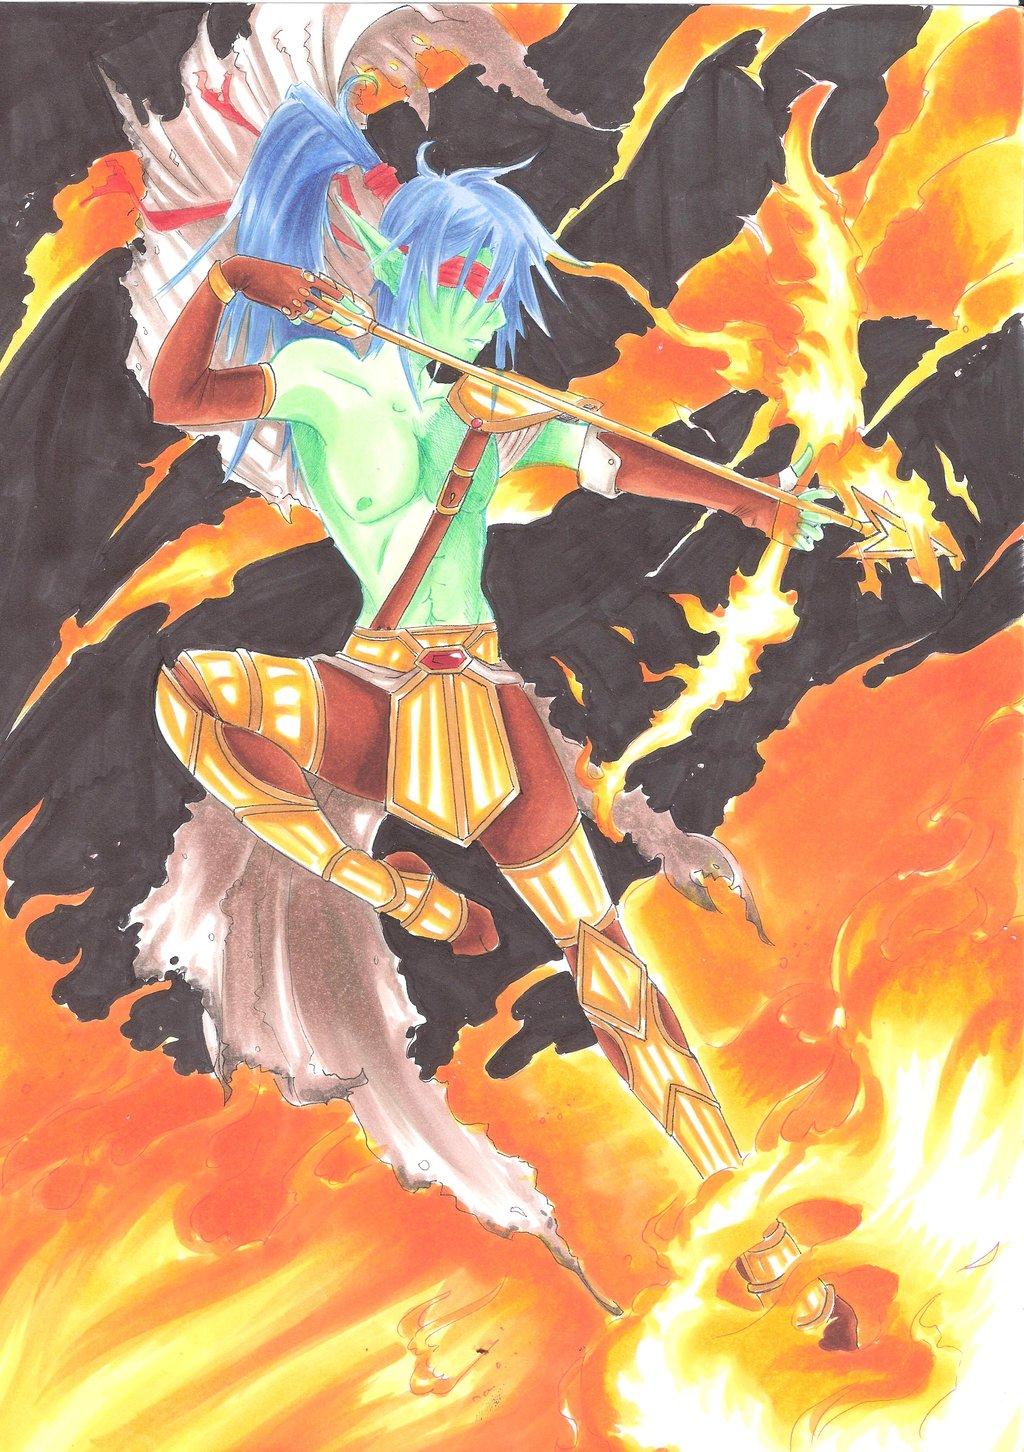 Best 43 Flameslinger Wallpaper on HipWallpaper Flameslinger 1024x1452